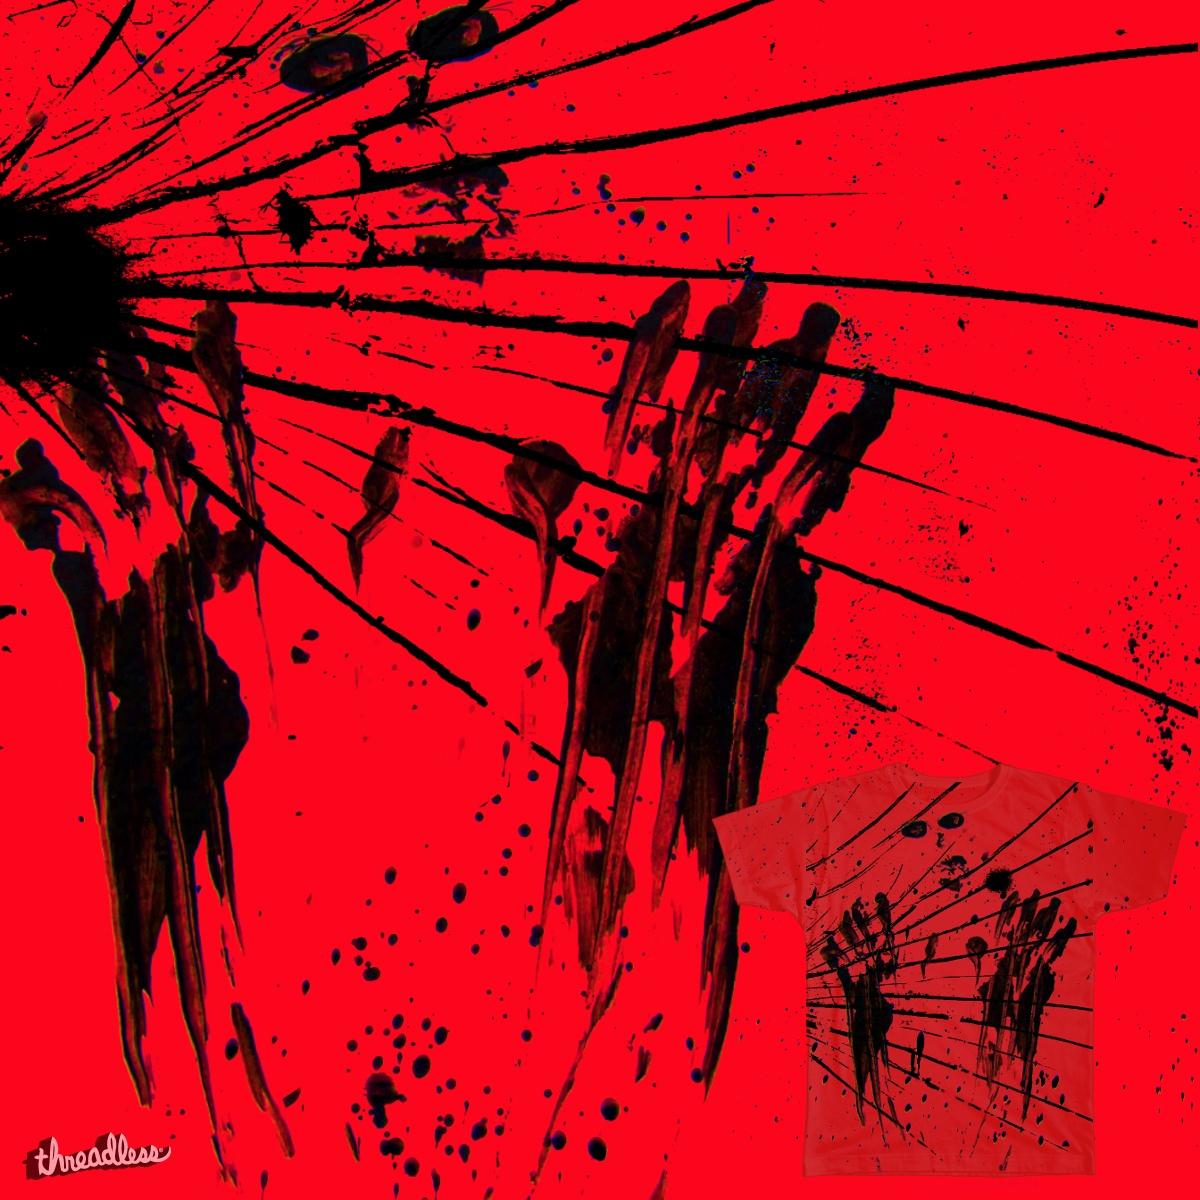 Terror by InverseSquare on Threadless